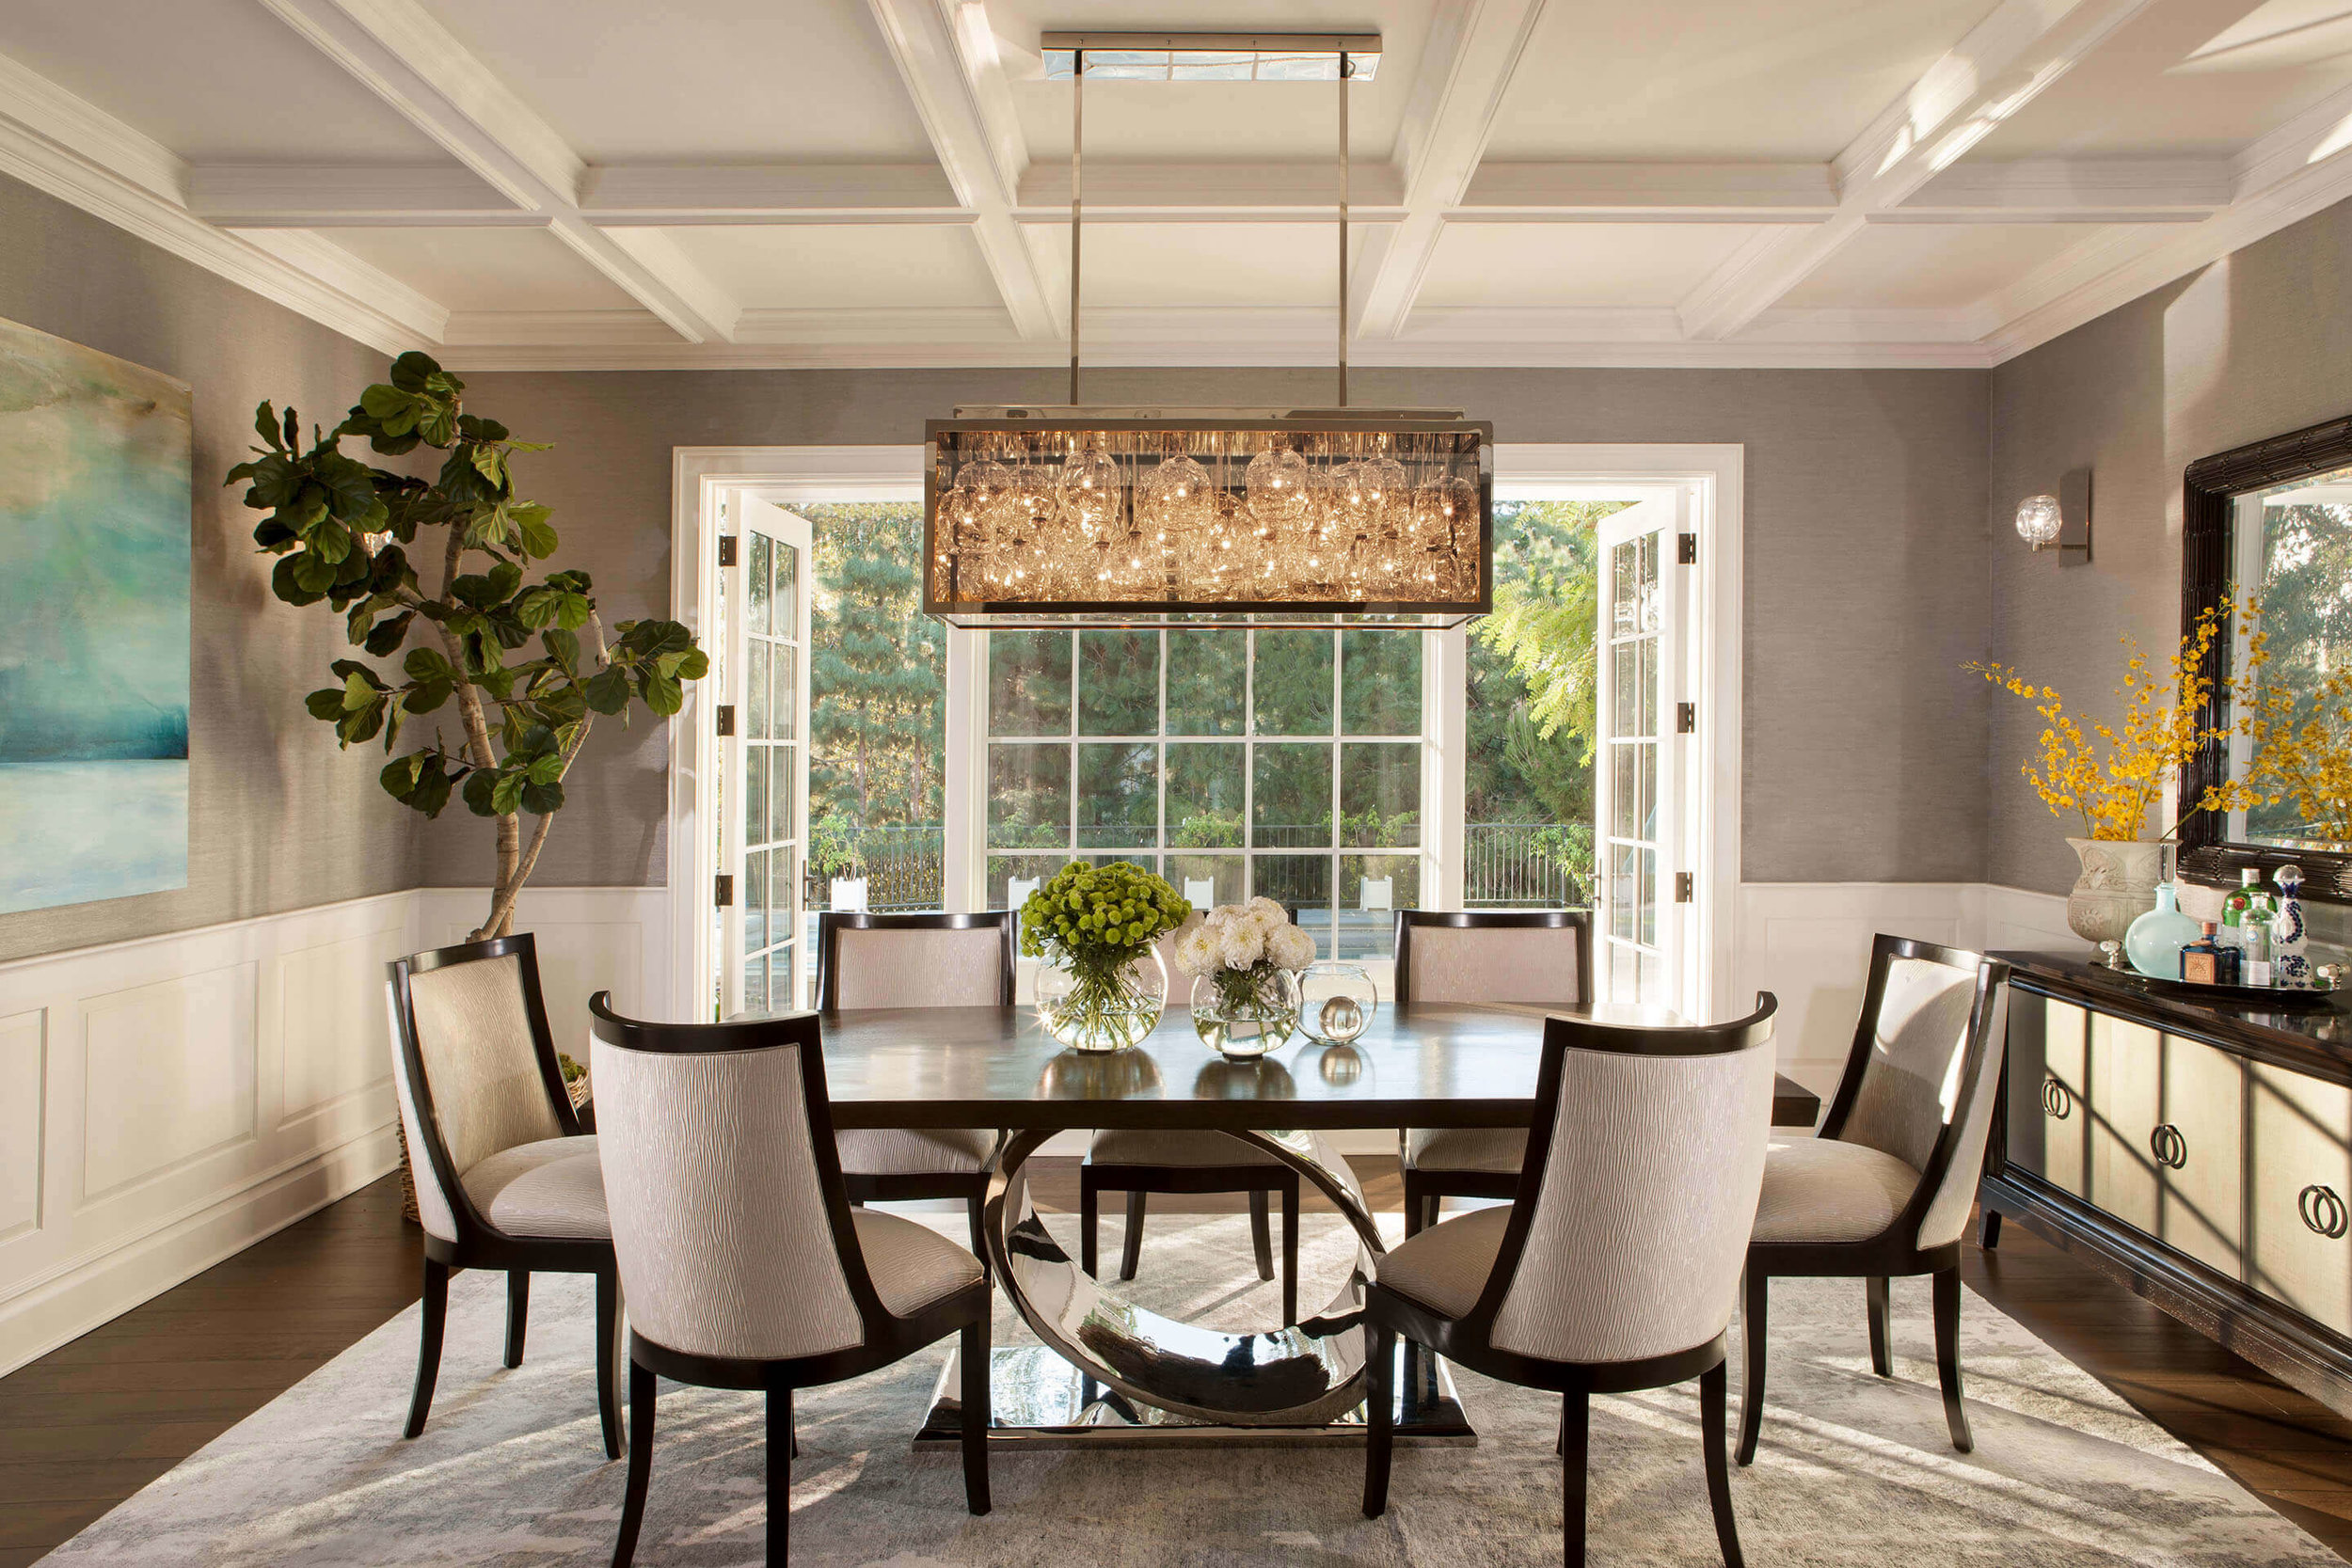 elizabeth-tapper-interiors-brentwood-dining-room.jpg